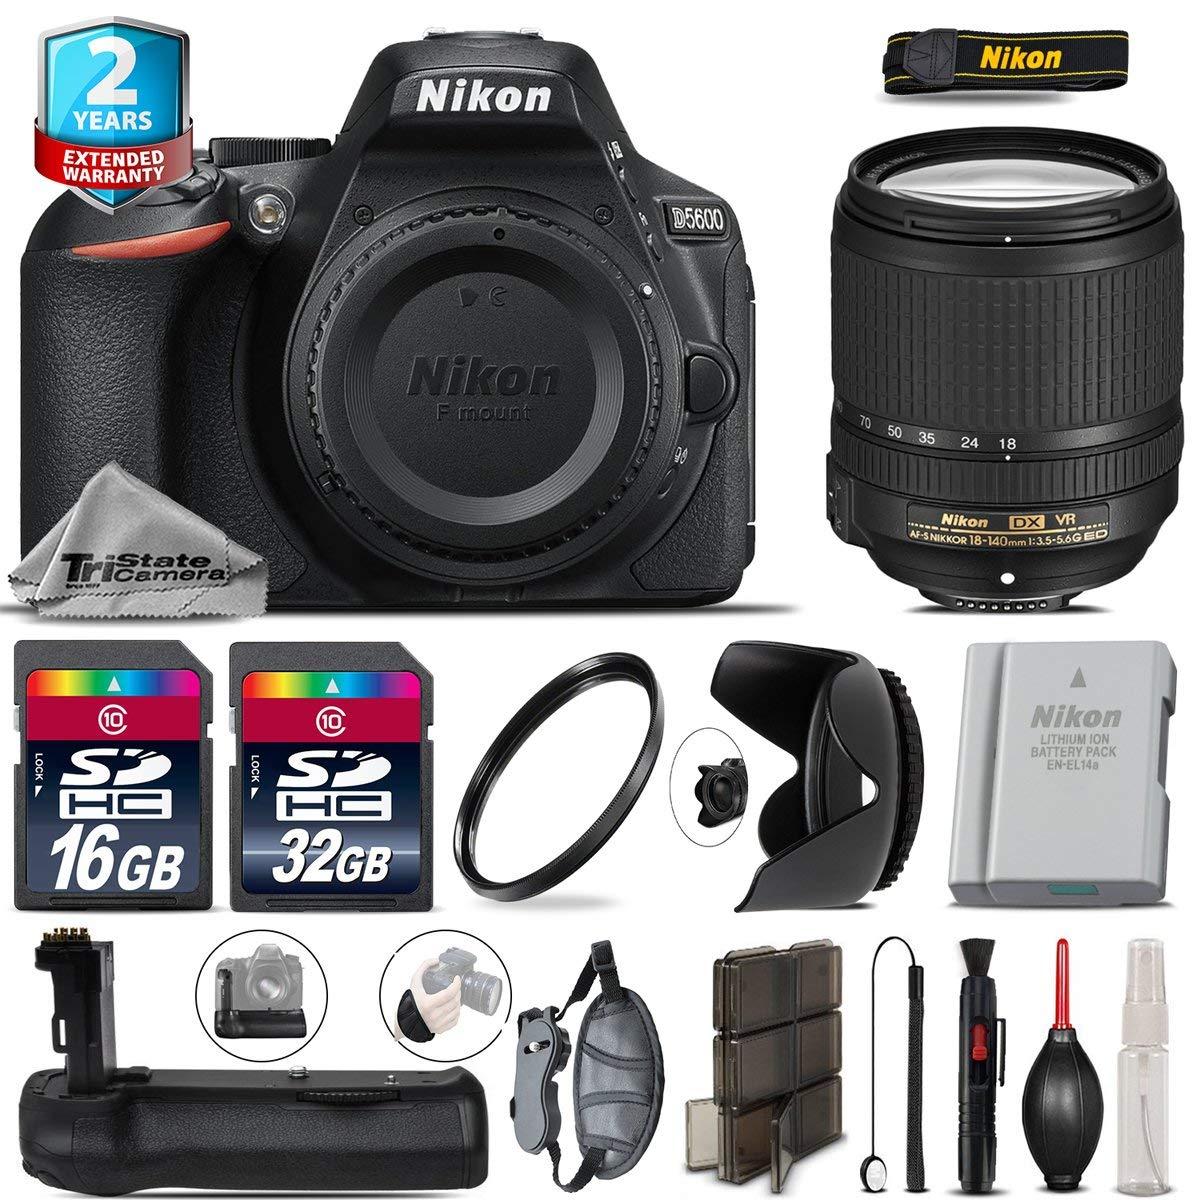 Holiday Saving Bundle for D5600 DSLR Camera + 18-140mm VR Lens + Battery Grip + 2yr Extended Warranty + 32GB Class 10 + Backup Battery + 16GB Class 10 + Wrist Strap + Tulip - International Version